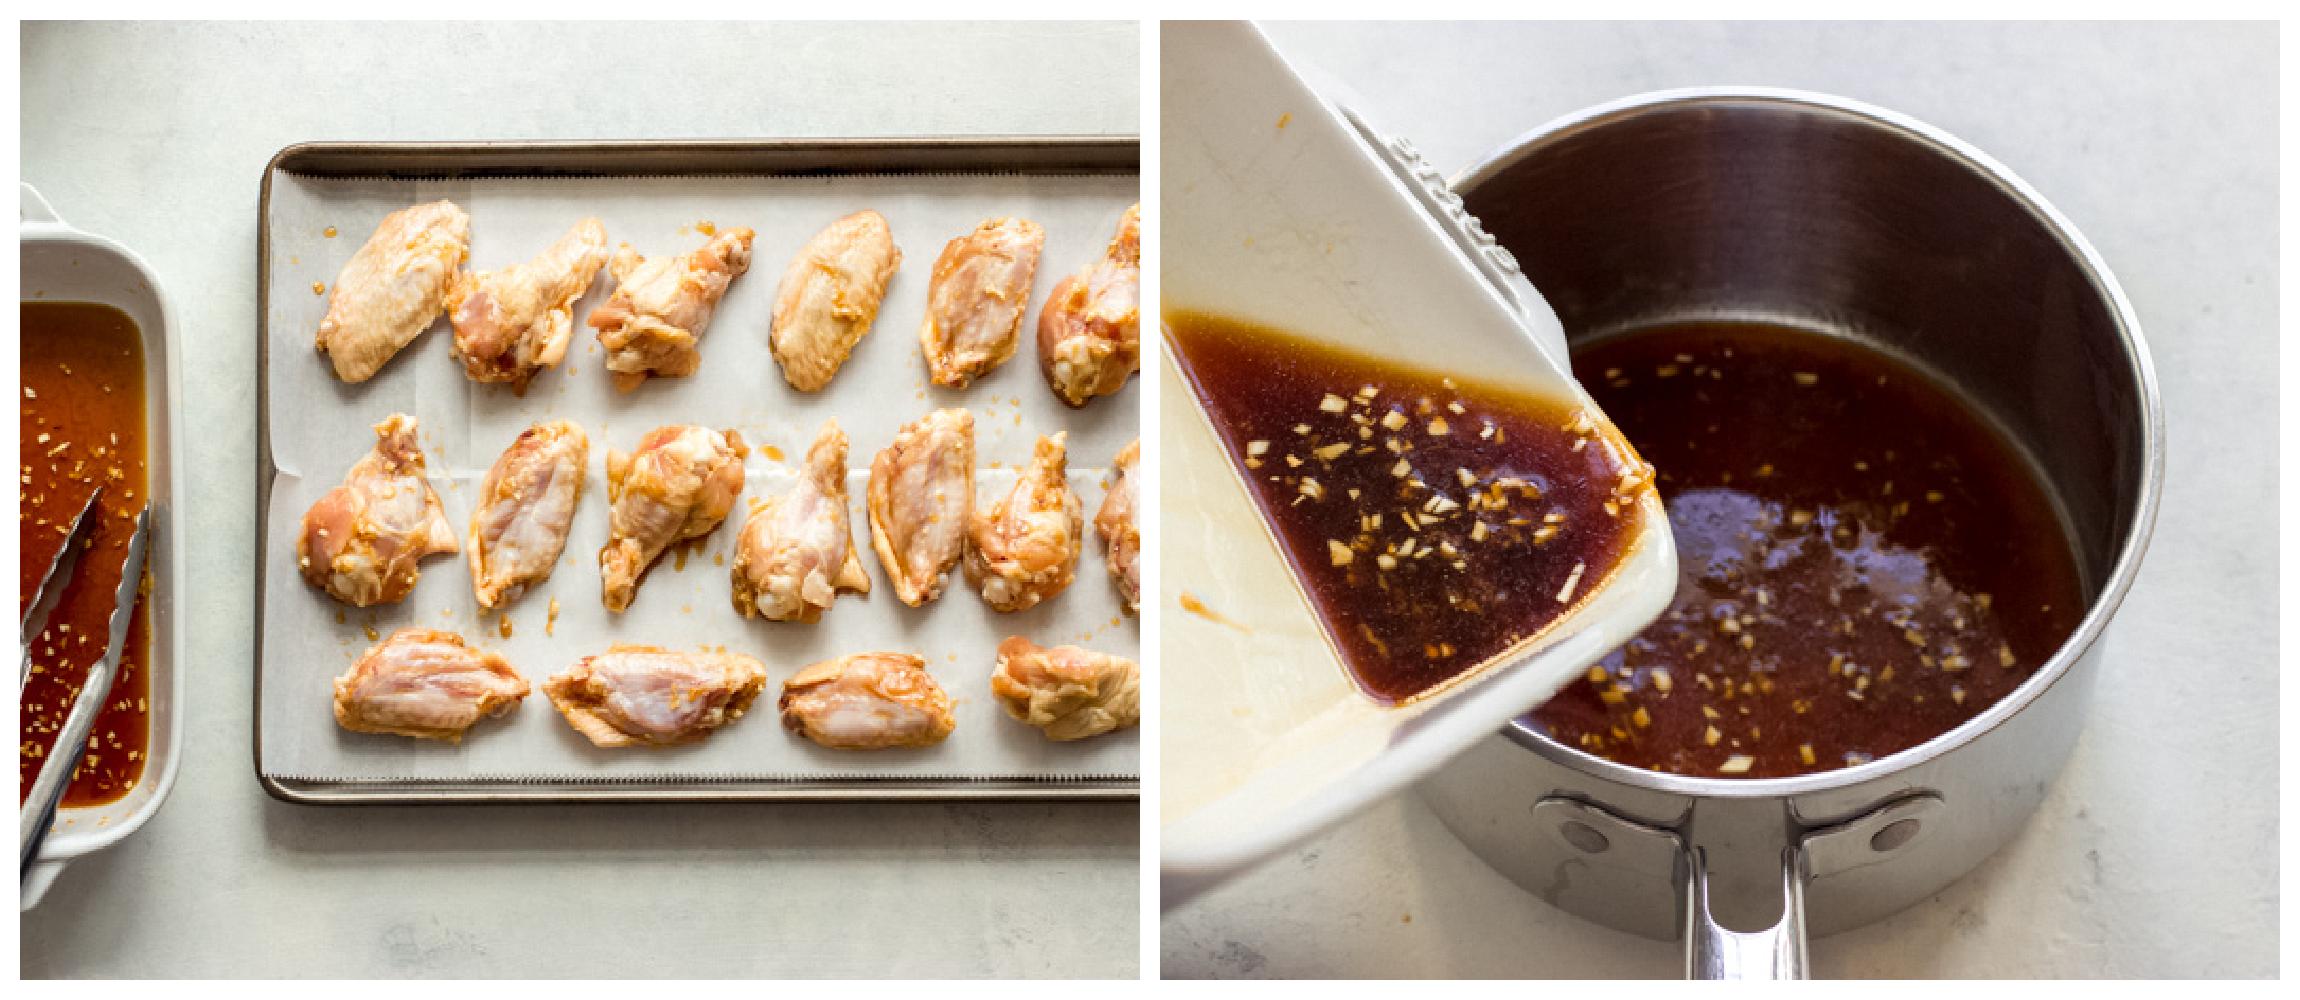 sesame chicken wings on a baking sheet